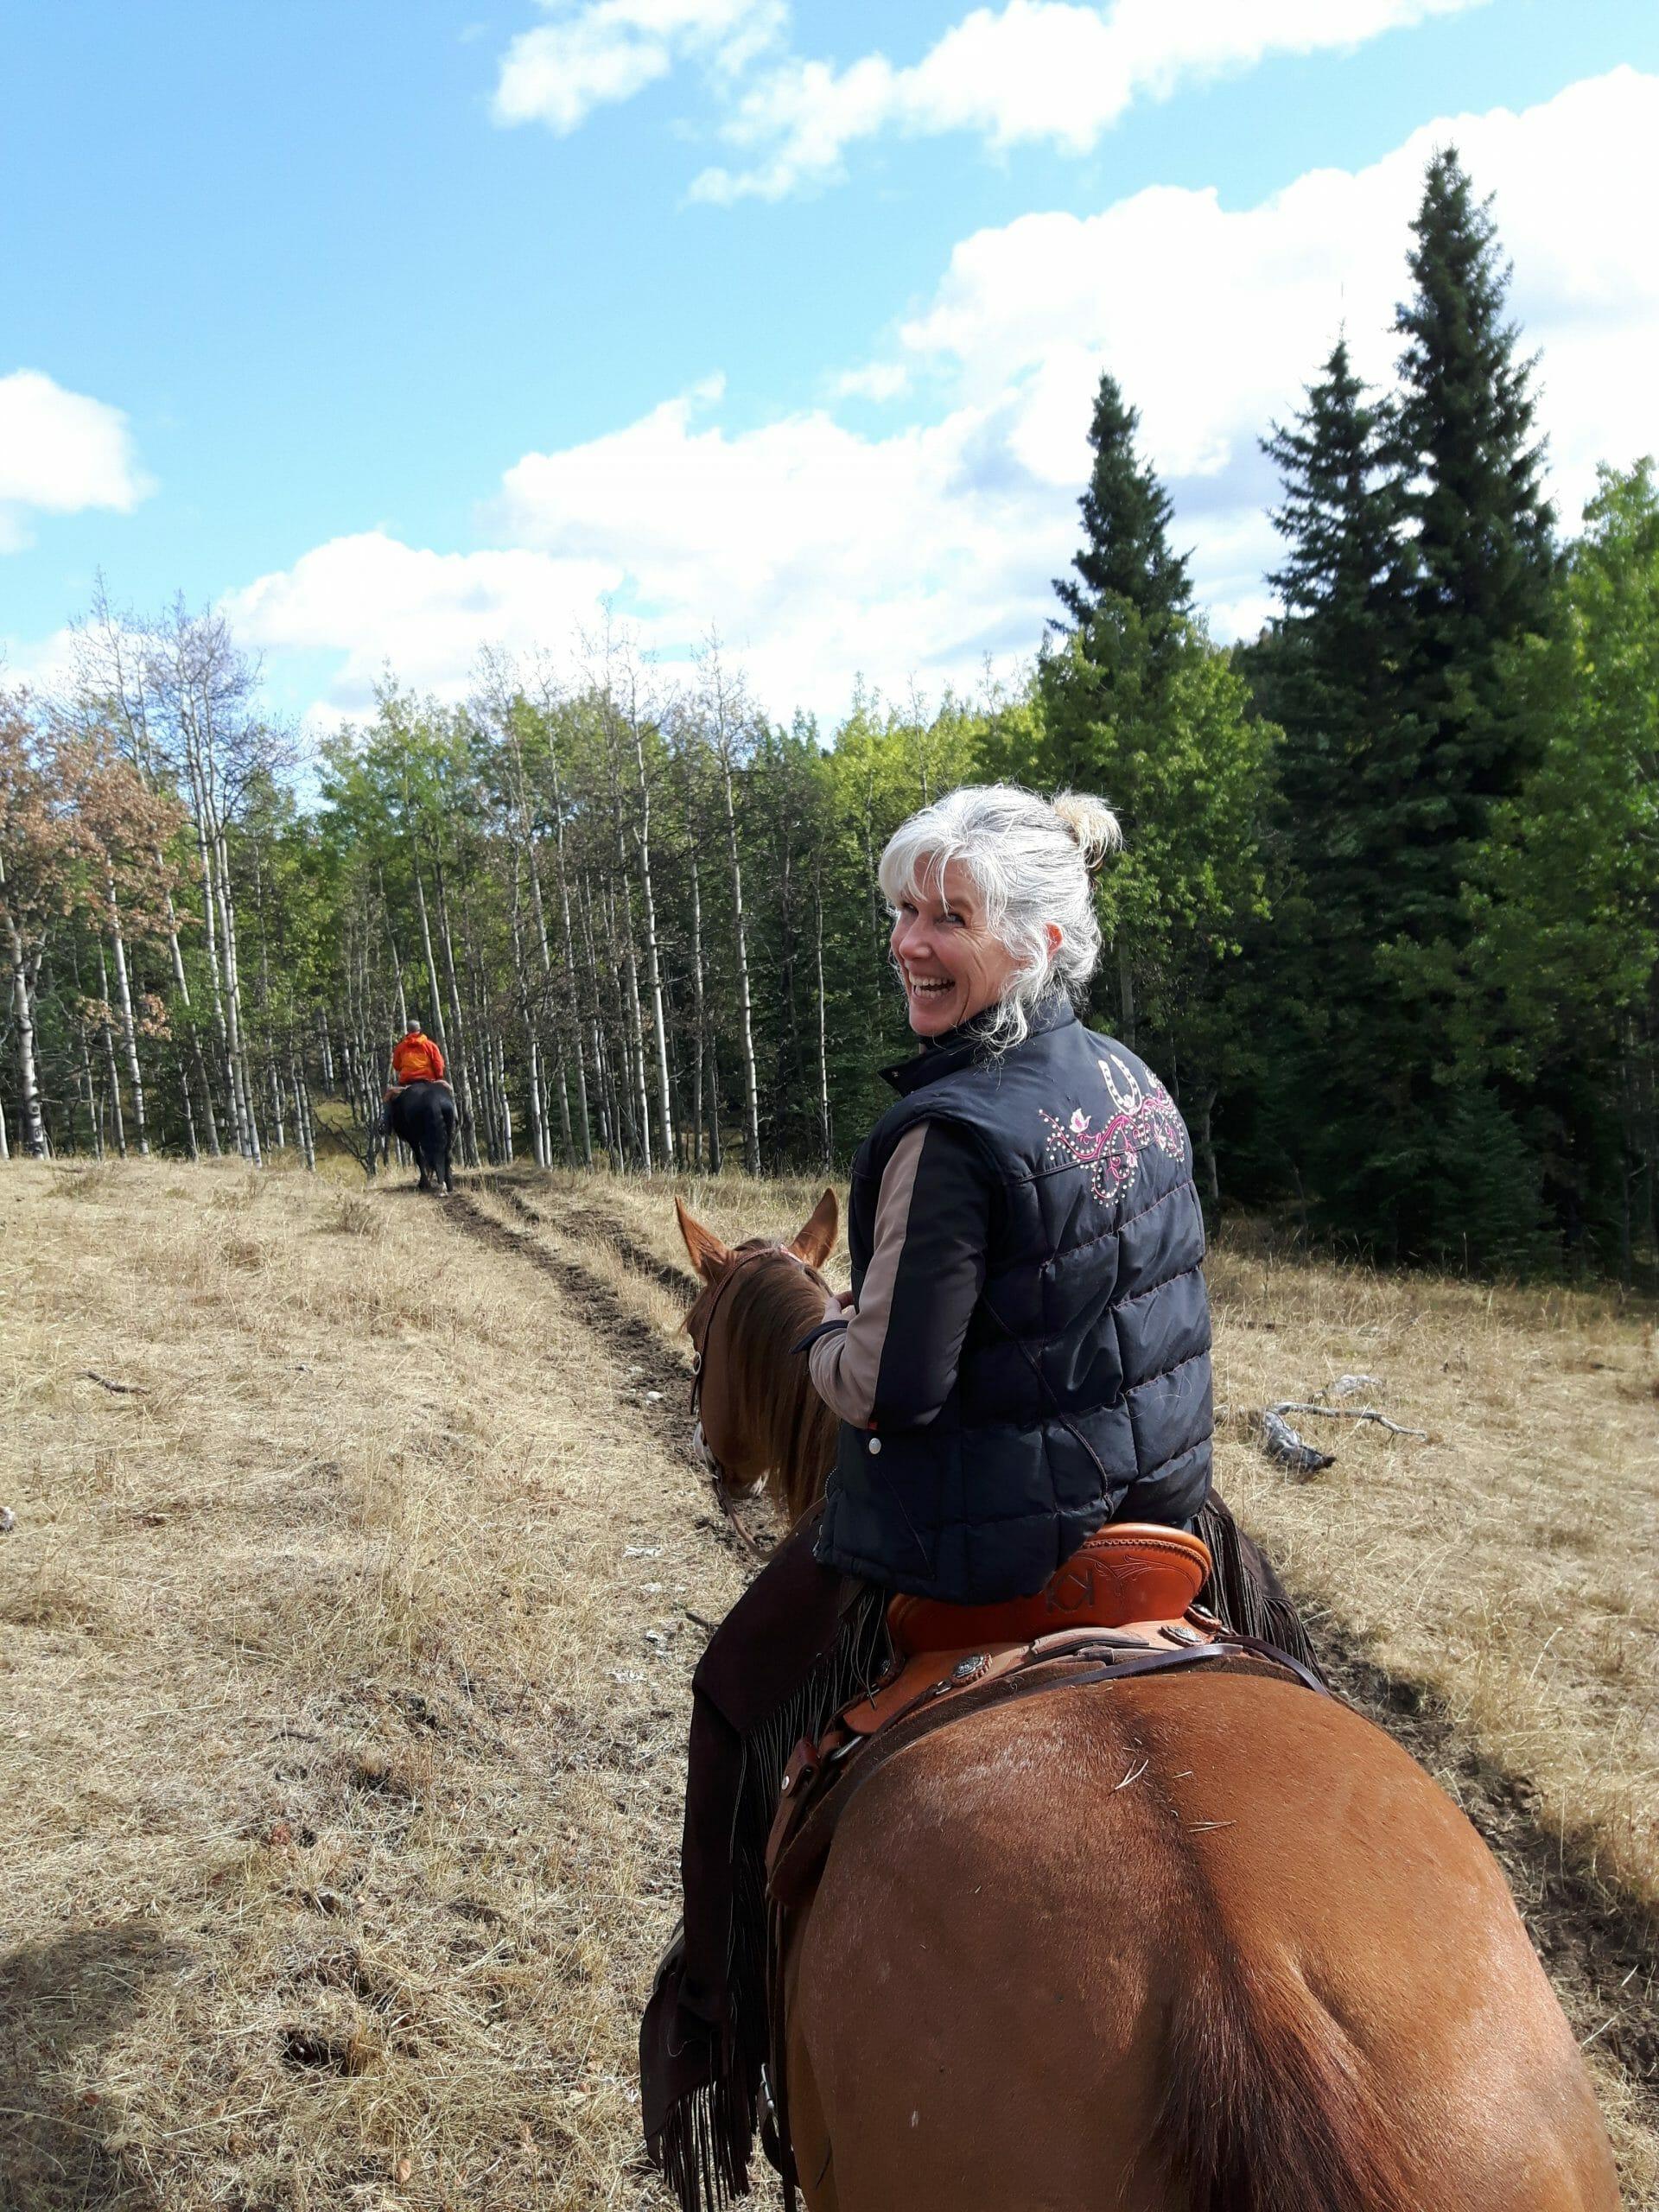 empowering women through horsemanship